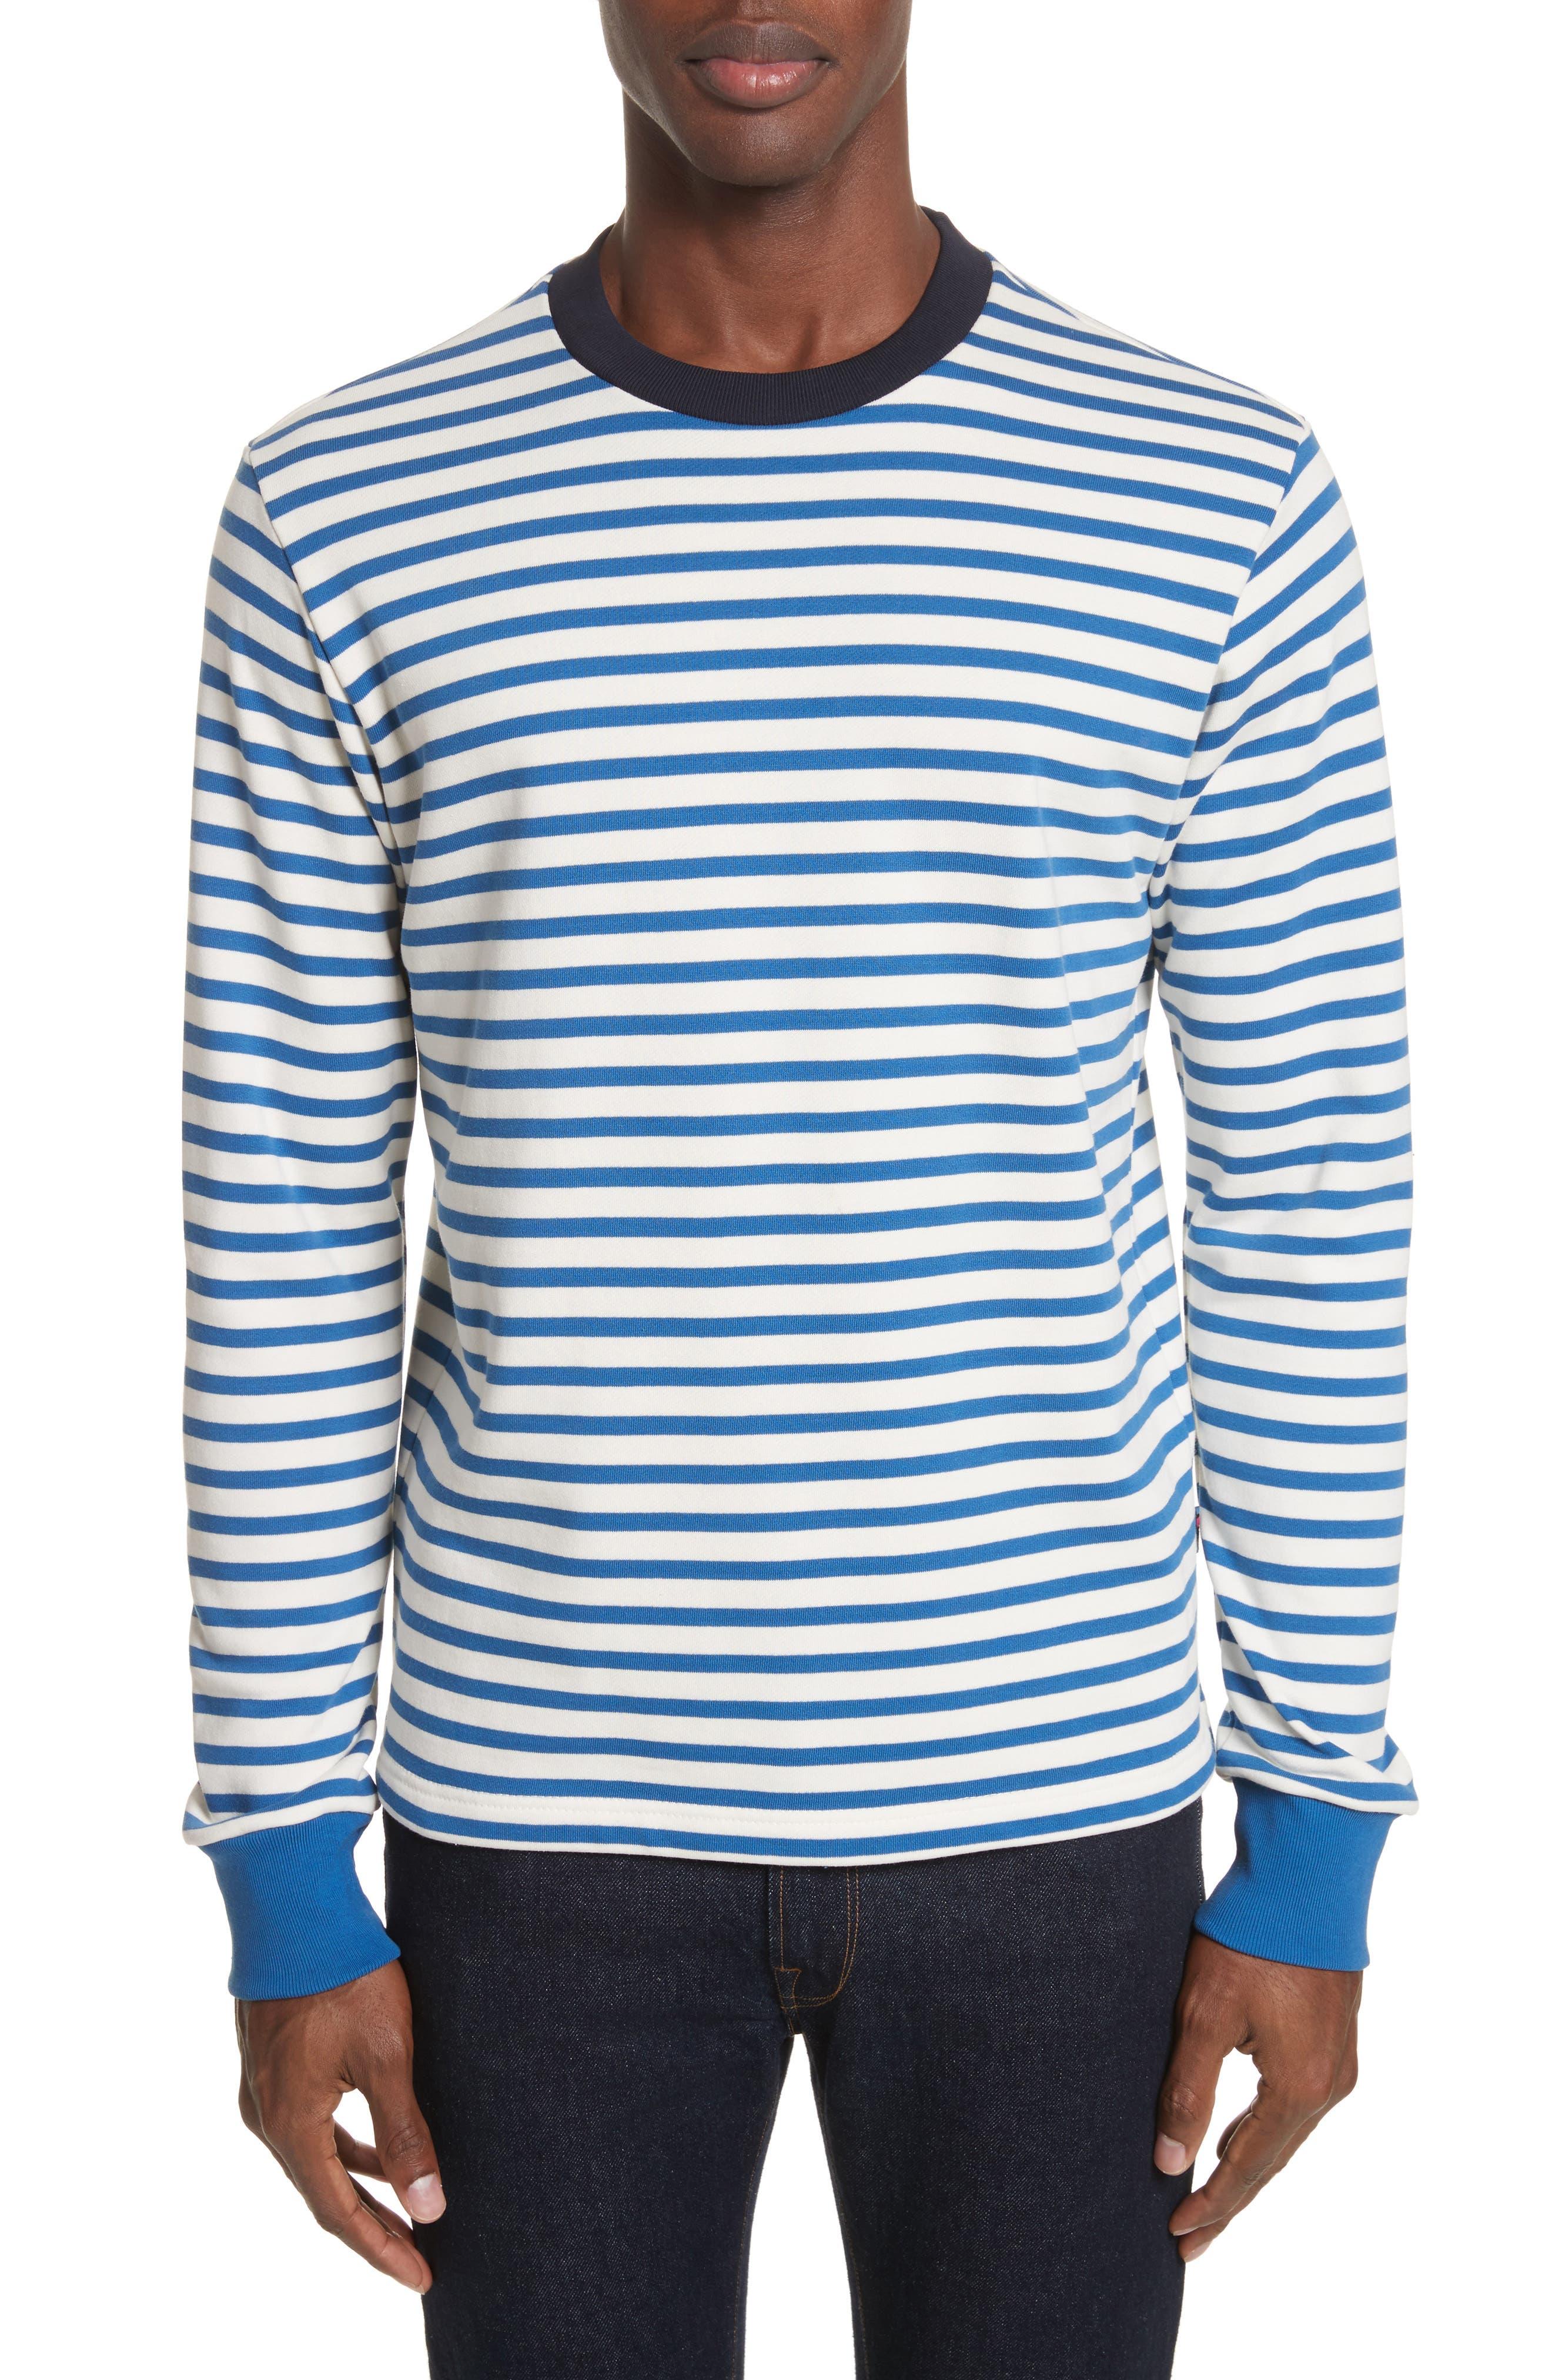 Stripe Crewneck Sweatshirt,                             Main thumbnail 1, color,                             434